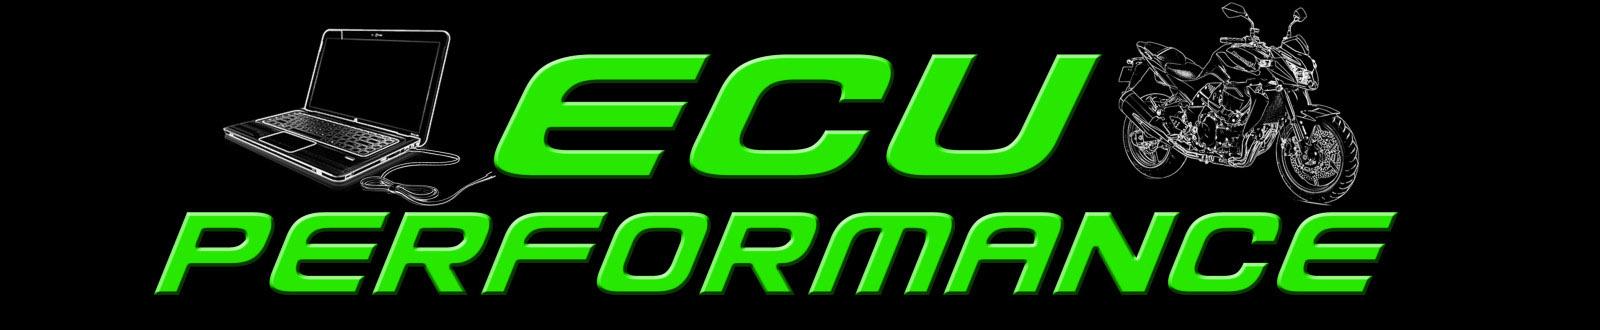 Definizioni XDF – Ecu-performance